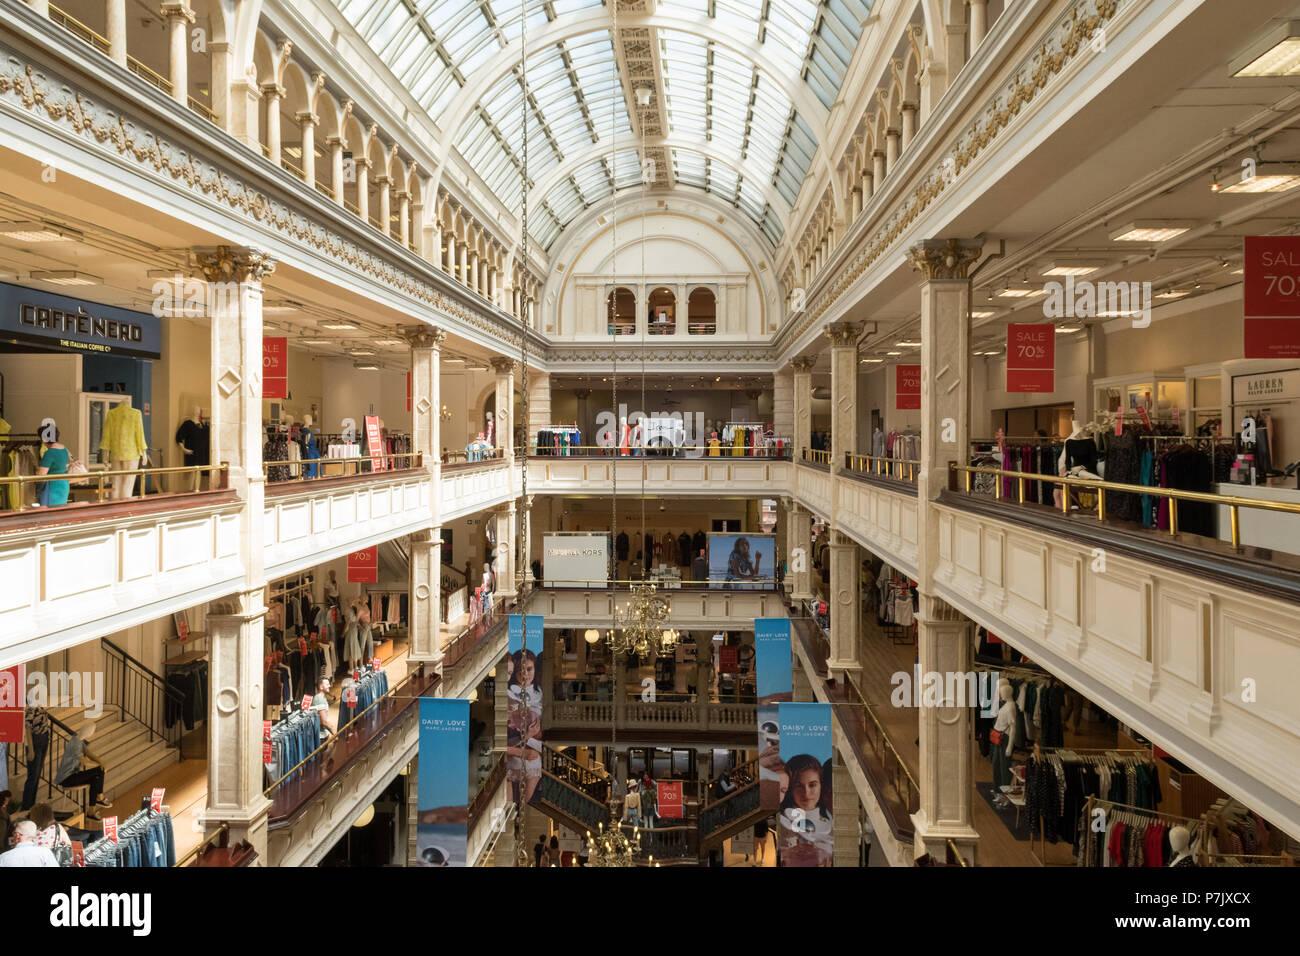 Frasers department store, Glasgow, Scotland, UK interior - Stock Image